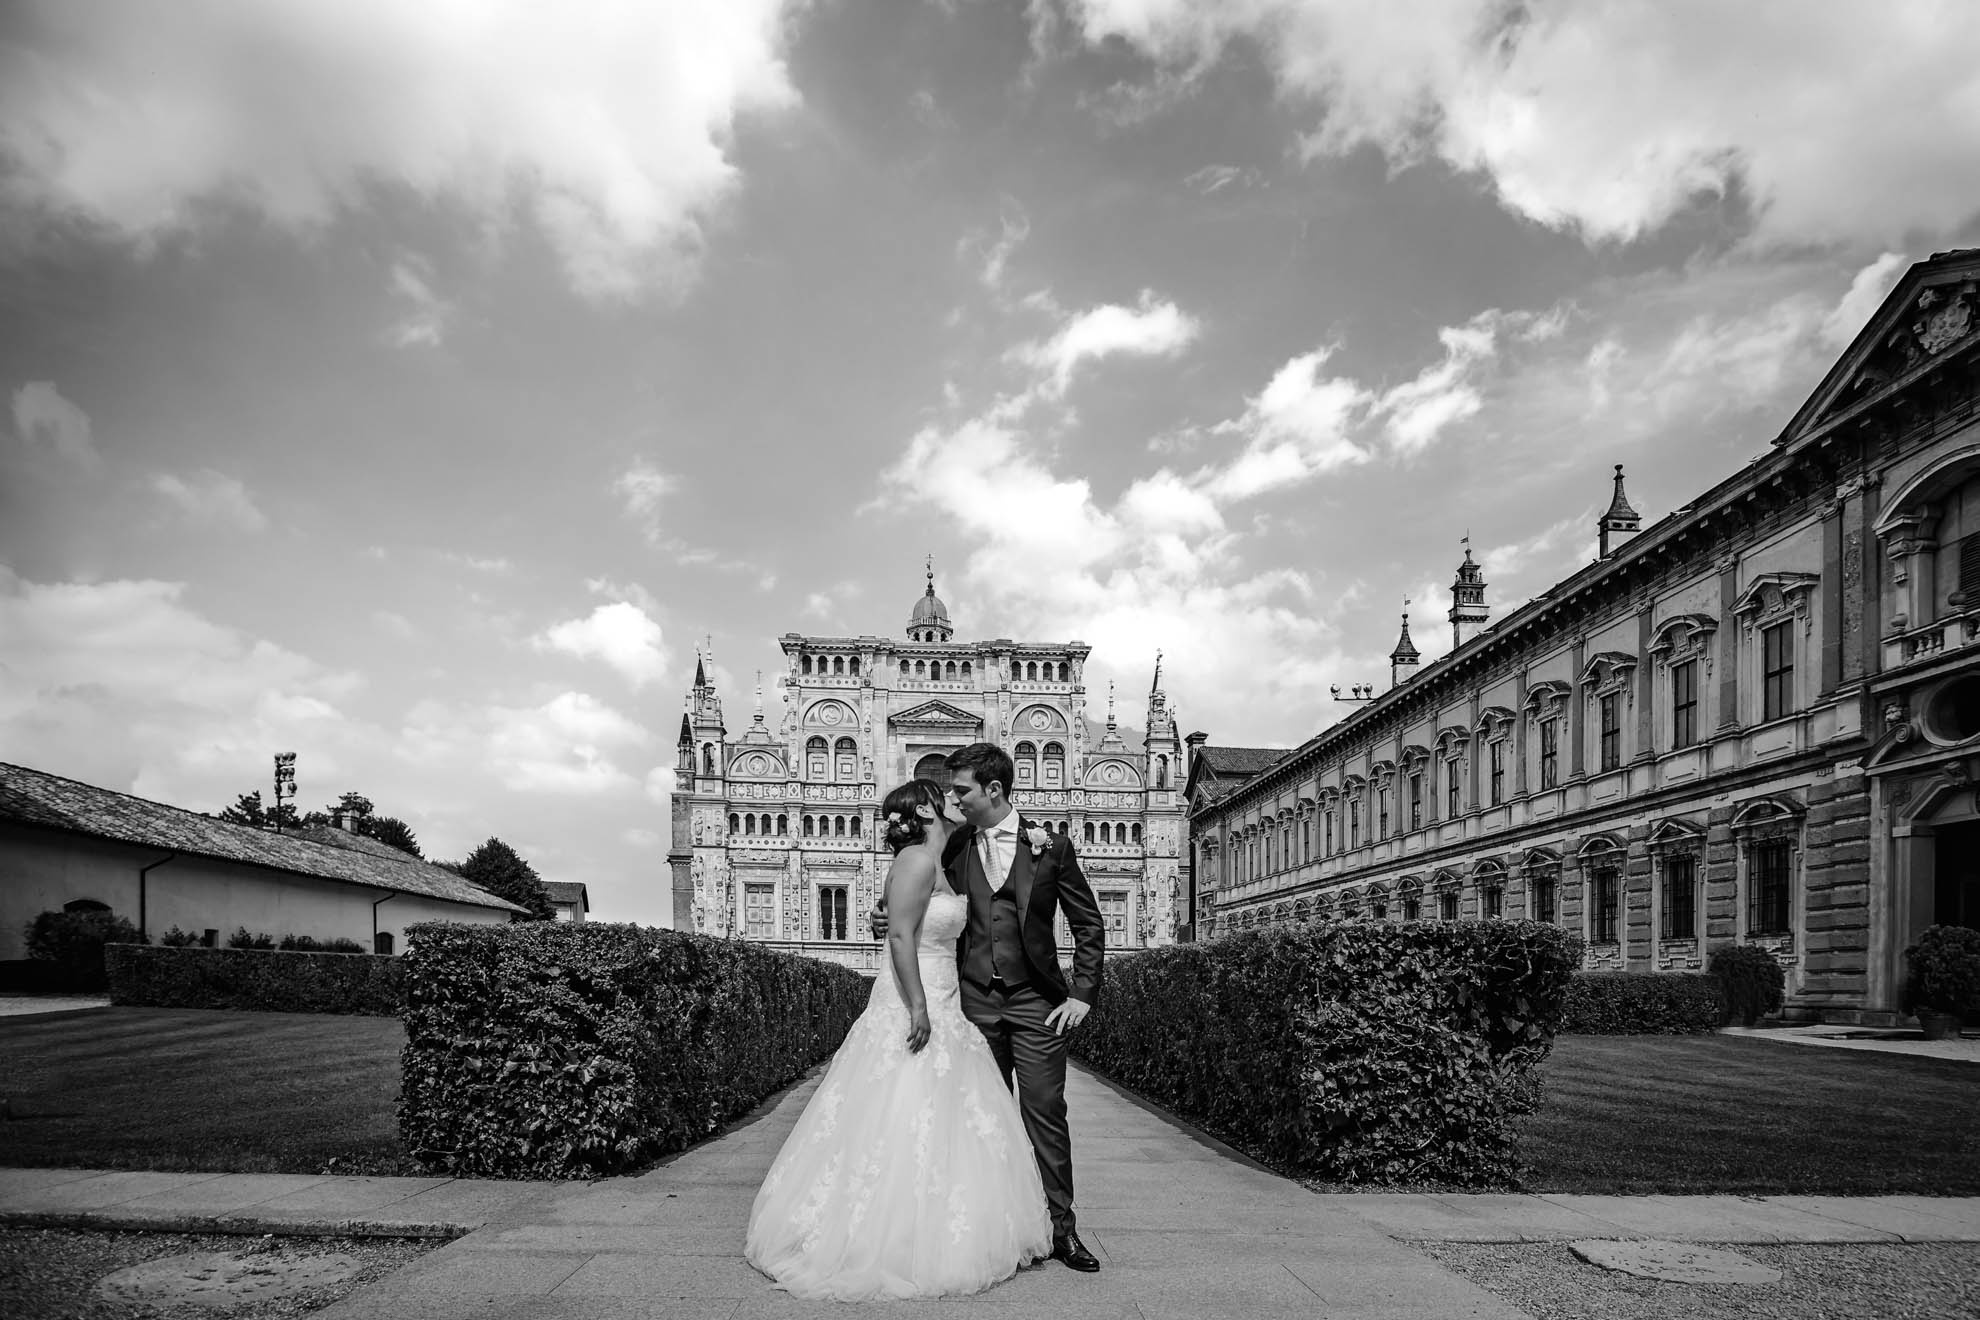 005 Fotografo per Matrimonio Diego Ravenna PaviaIMG_0767-Modifica